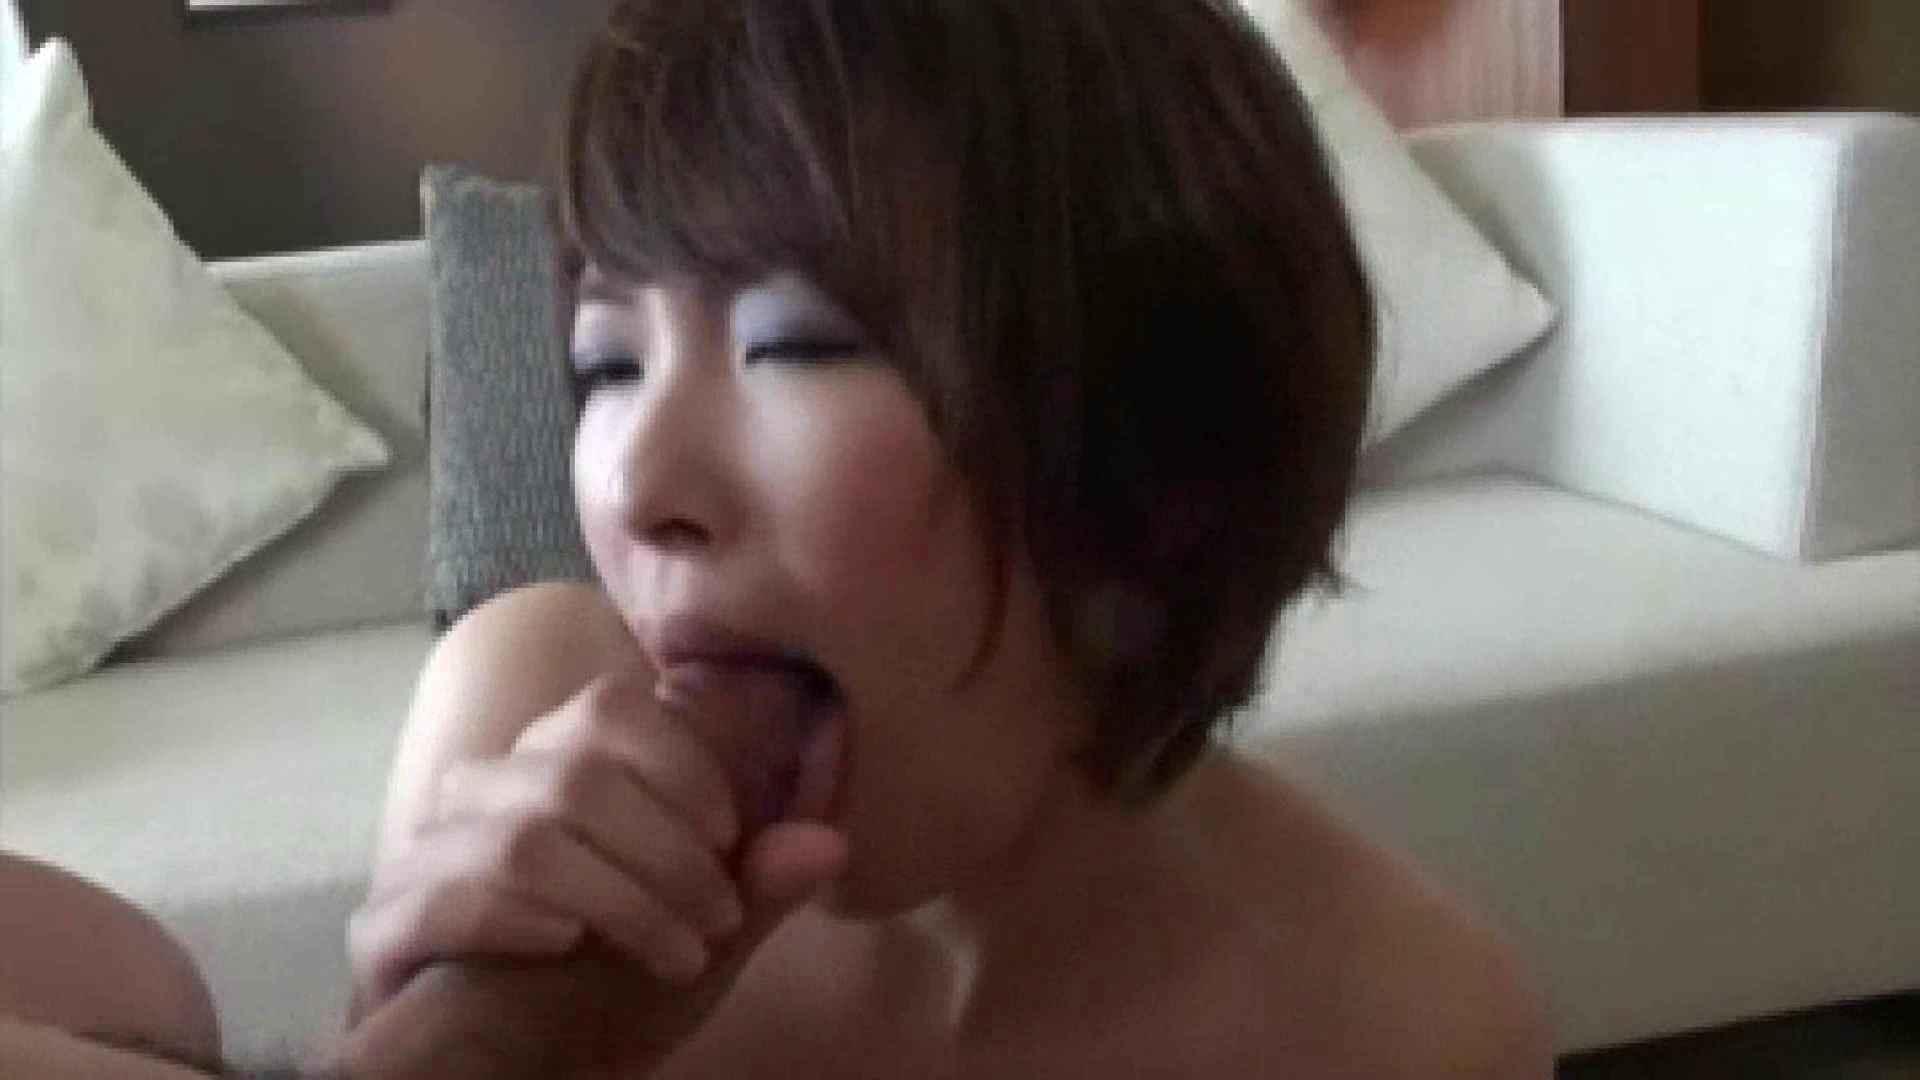 Hで可愛くてケシカラン! Vol.13 流出作品  54連発 48